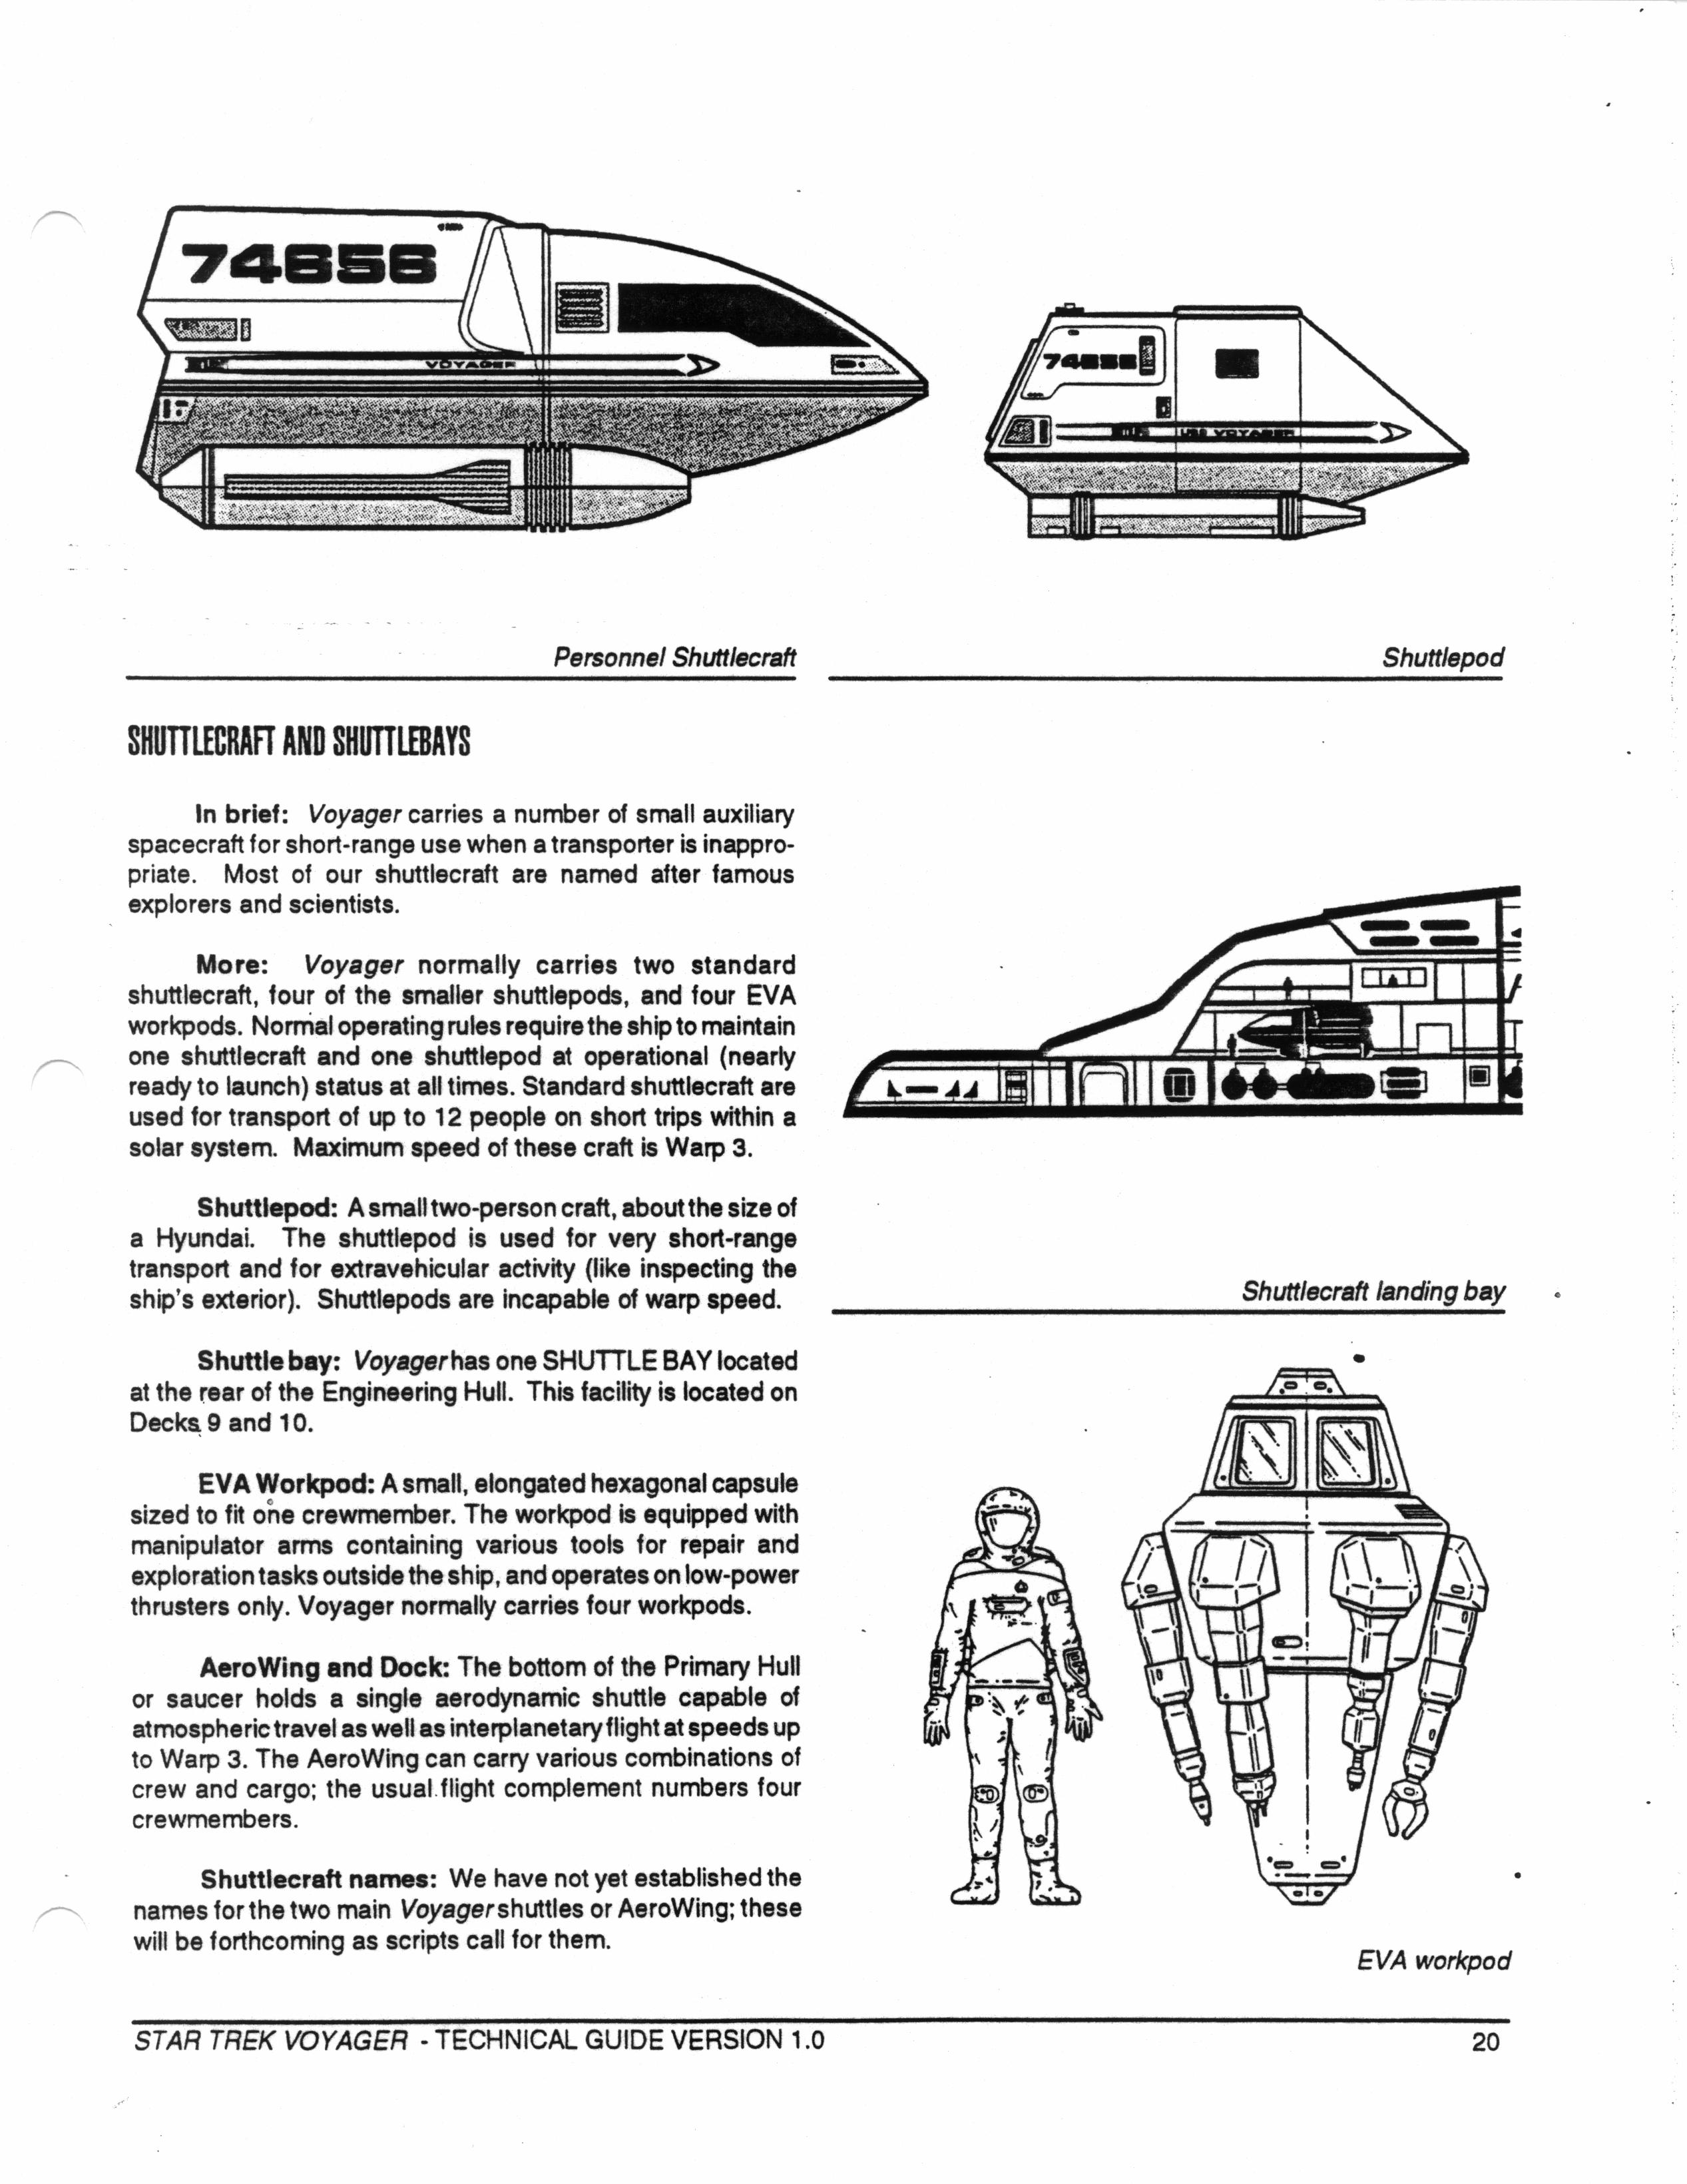 Star trek voyager spacecraft - Star Trek Voyager Technical Manual